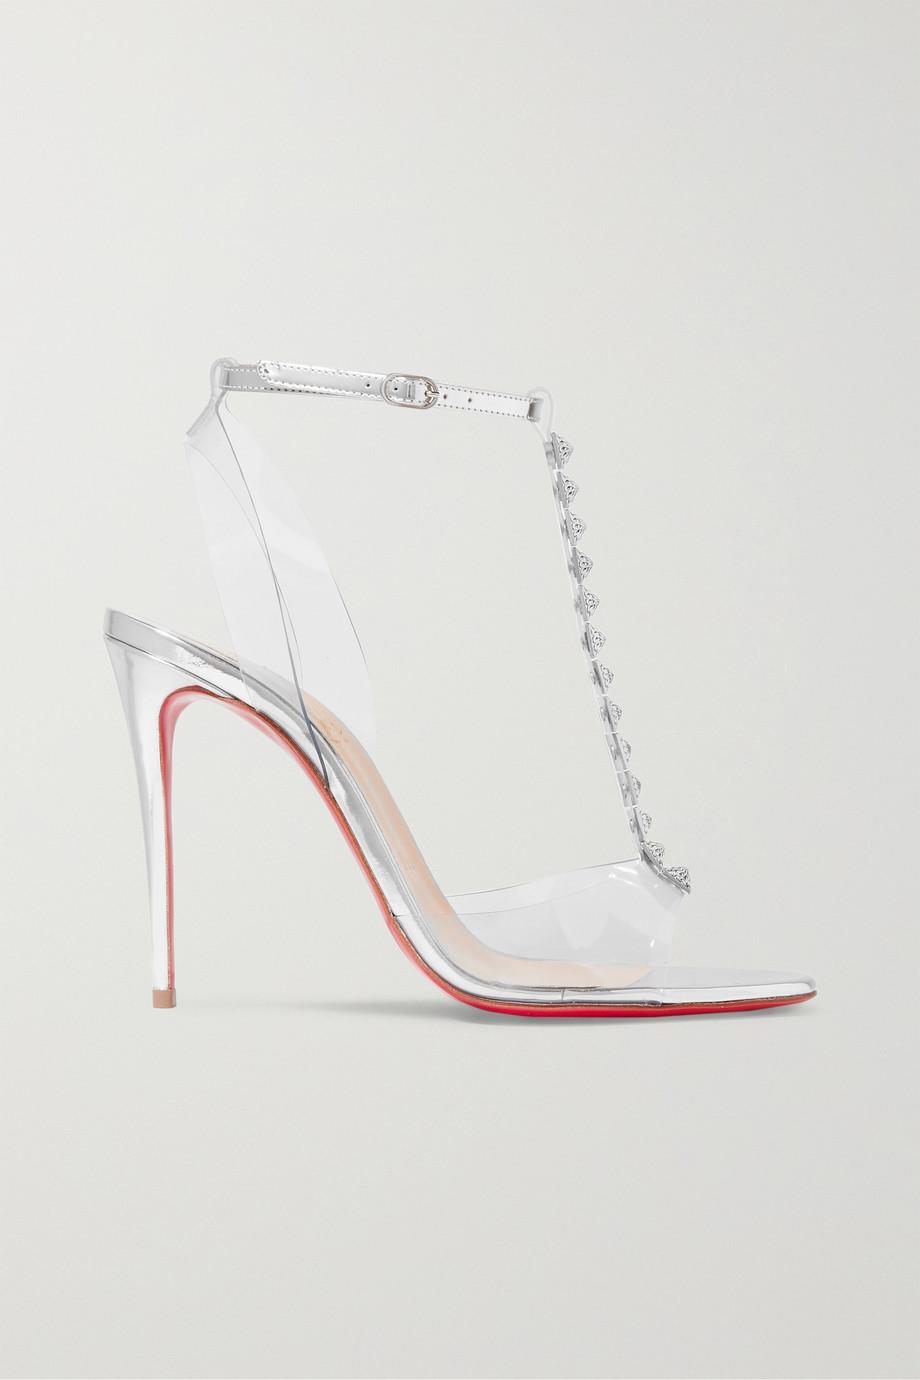 Christian Louboutin Jamais Assez 100 spiked PVC and metallic leather sandals